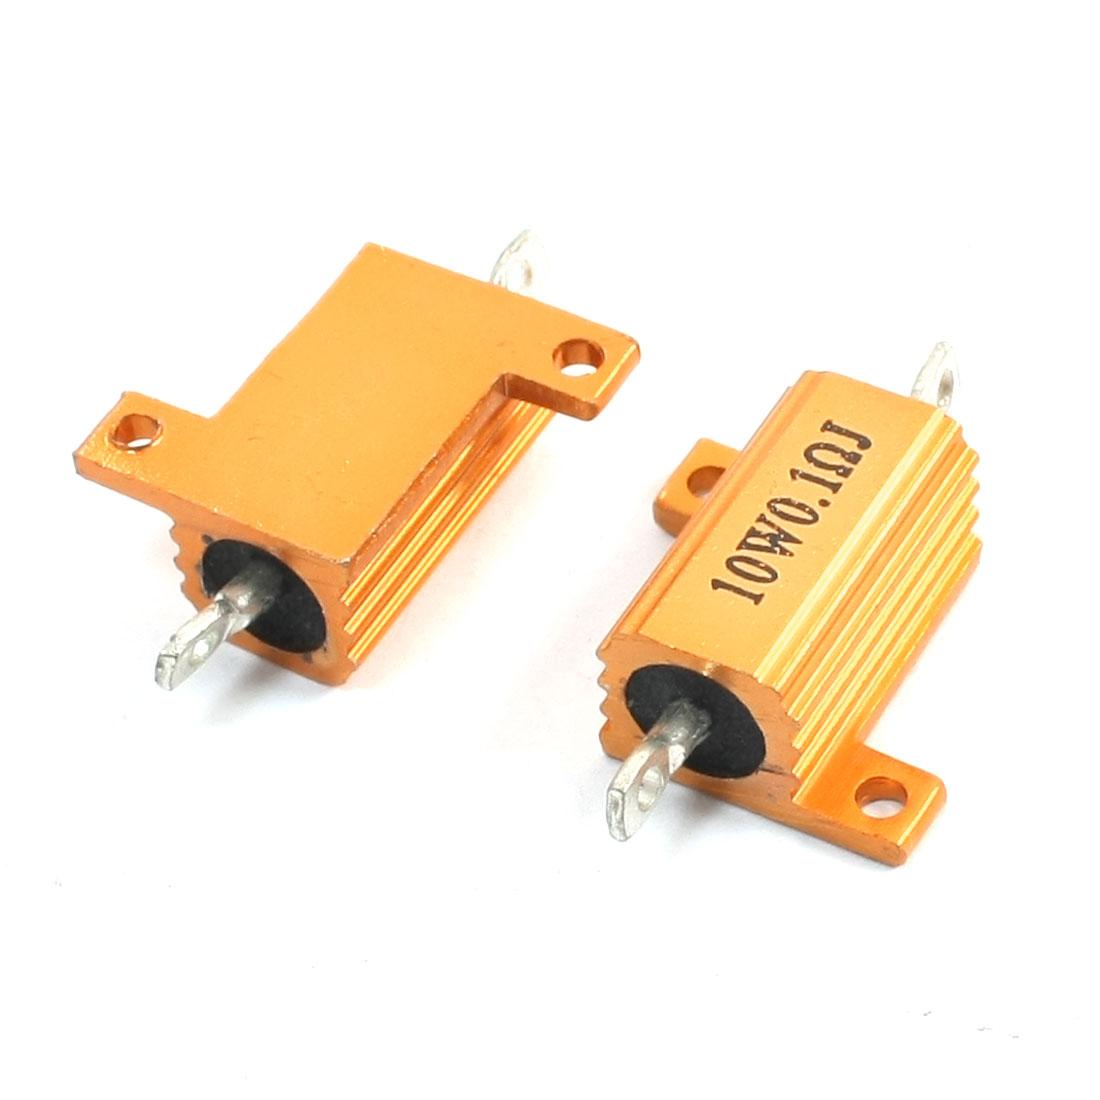 10W 0.1 Ohm Resistance Gold Tone Aluminum Clad Wirewound Resistor 2Pcs